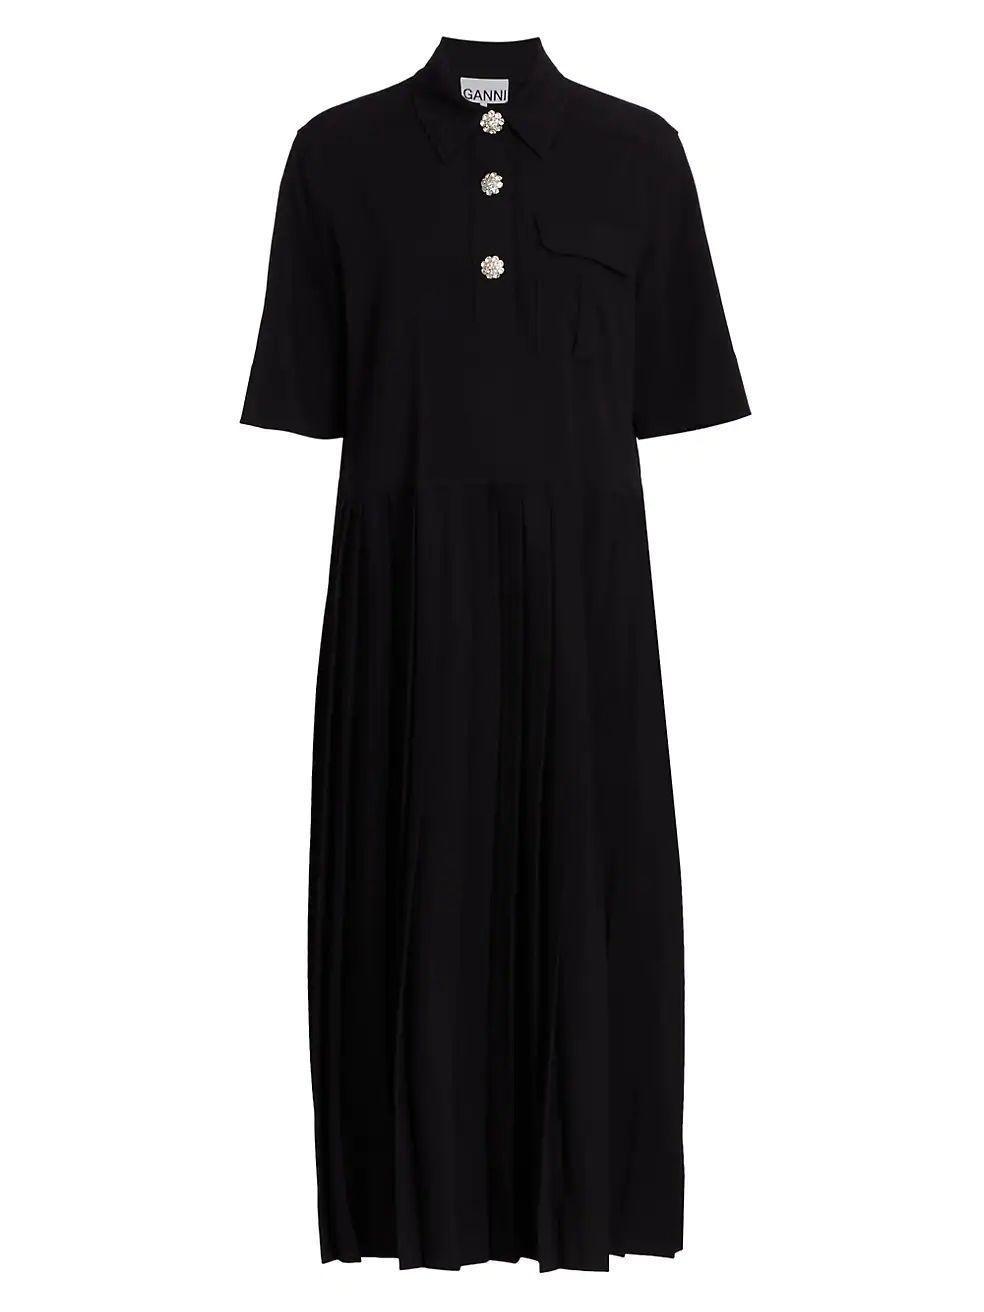 Melange Suiting Dress Item # F5661